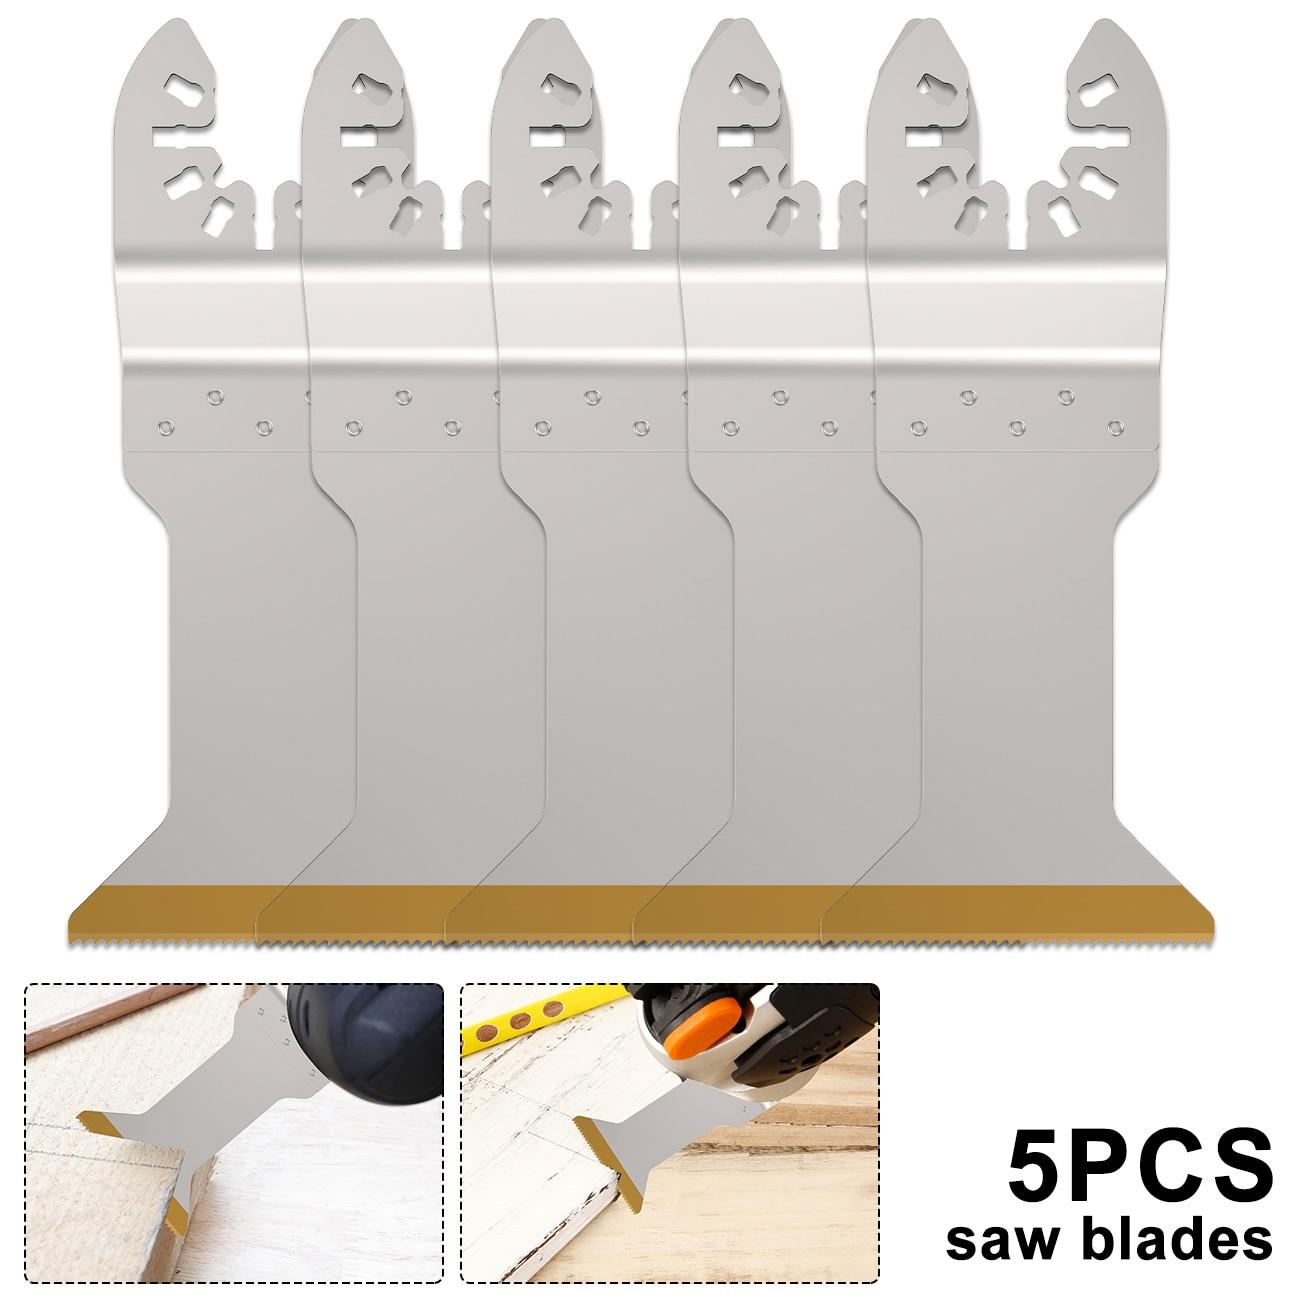 5pcs Multi-Function Bi-metal Precision Saw Blade Oscillating Multi Tool Saw Blade For Renovator Power Cutting Multimaster Tools